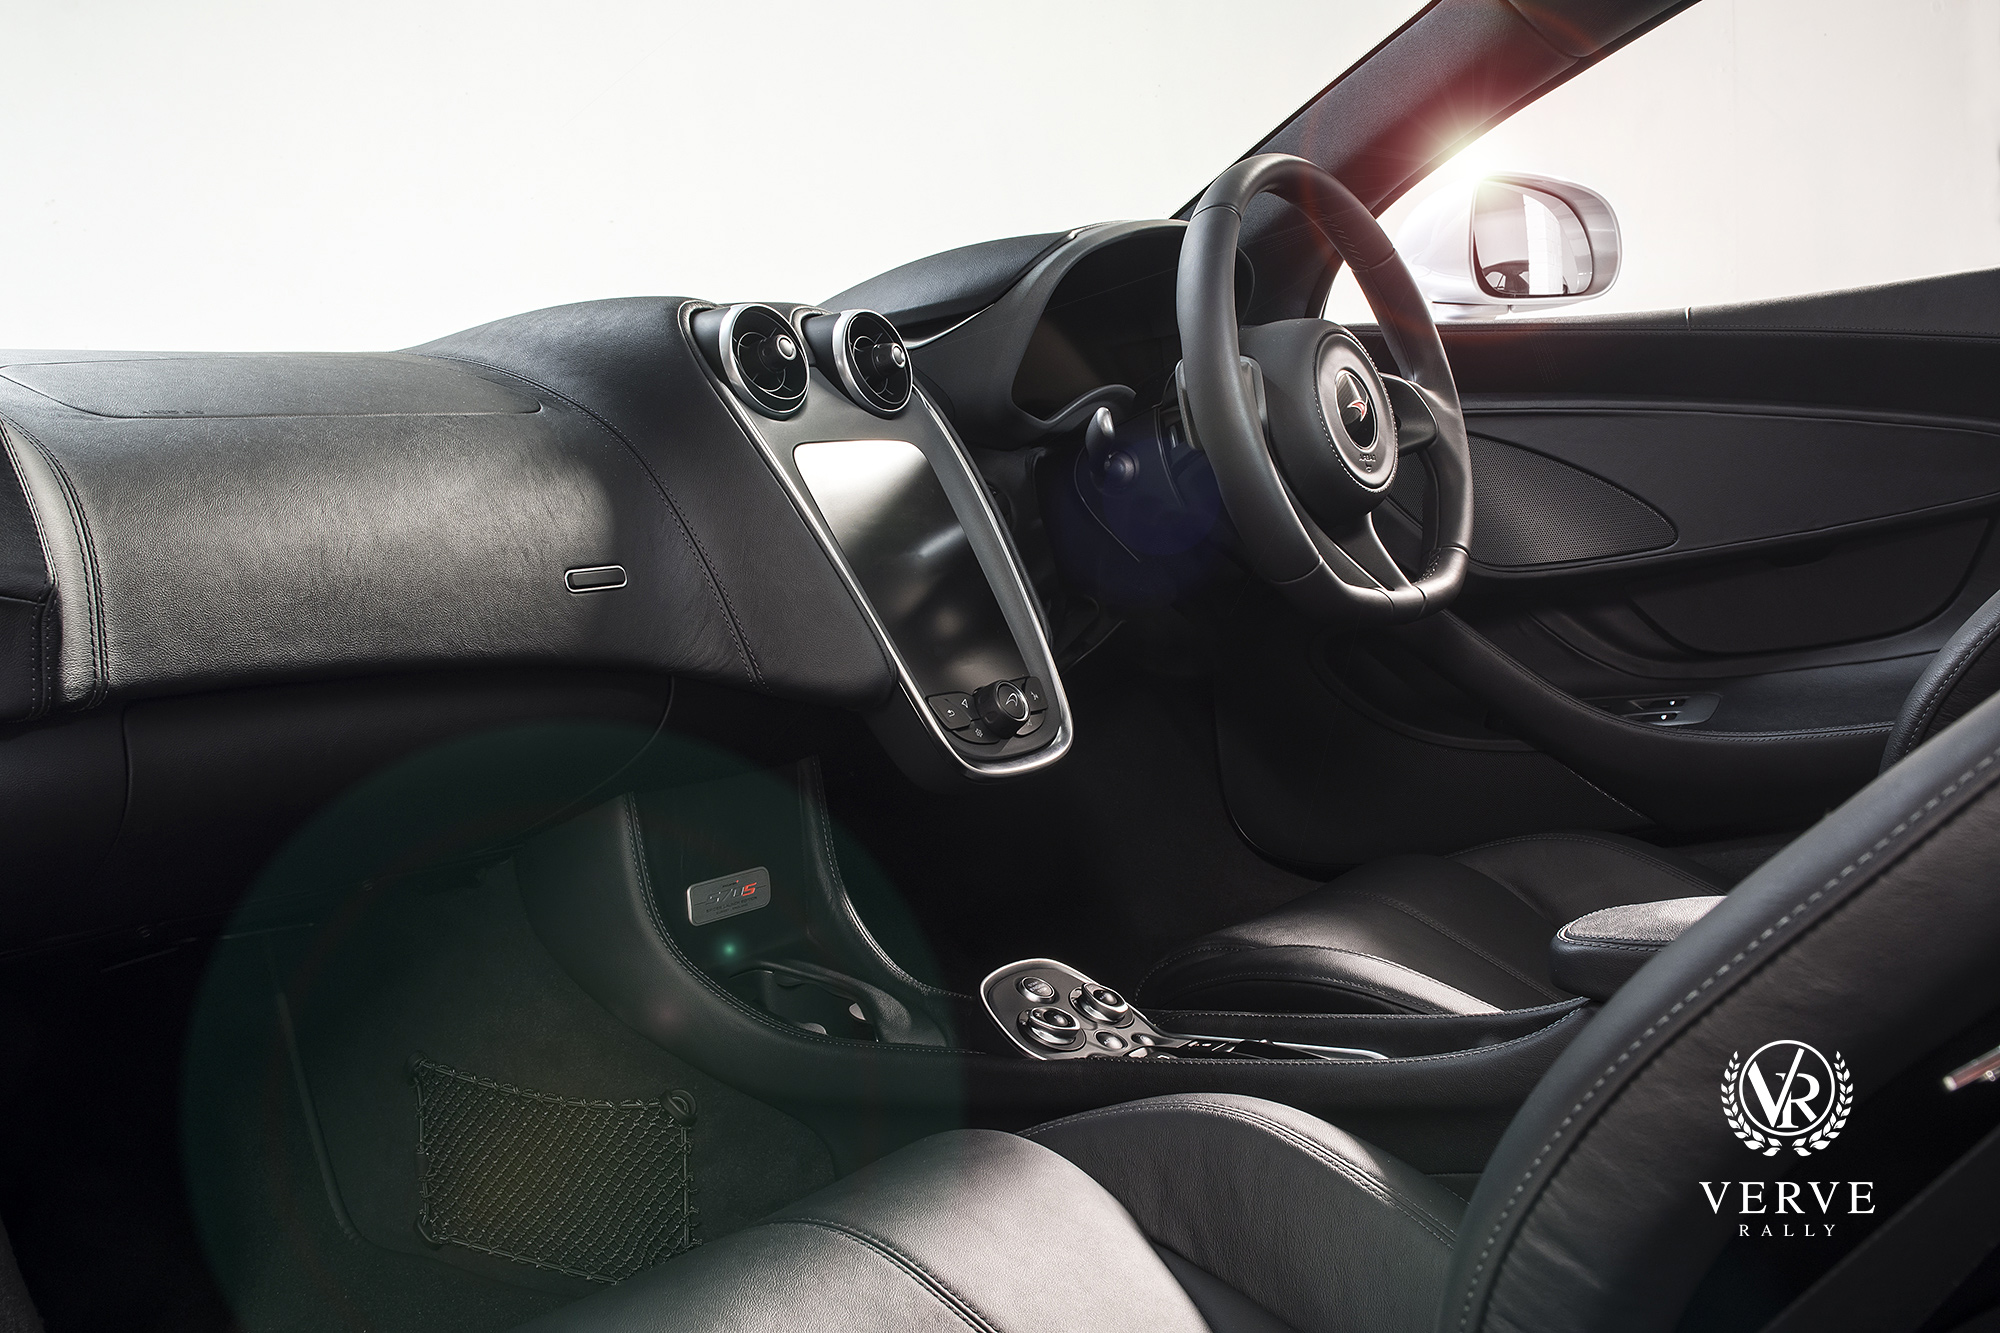 Verve-Rally-GT-Supercars---McLaren-570S-interior